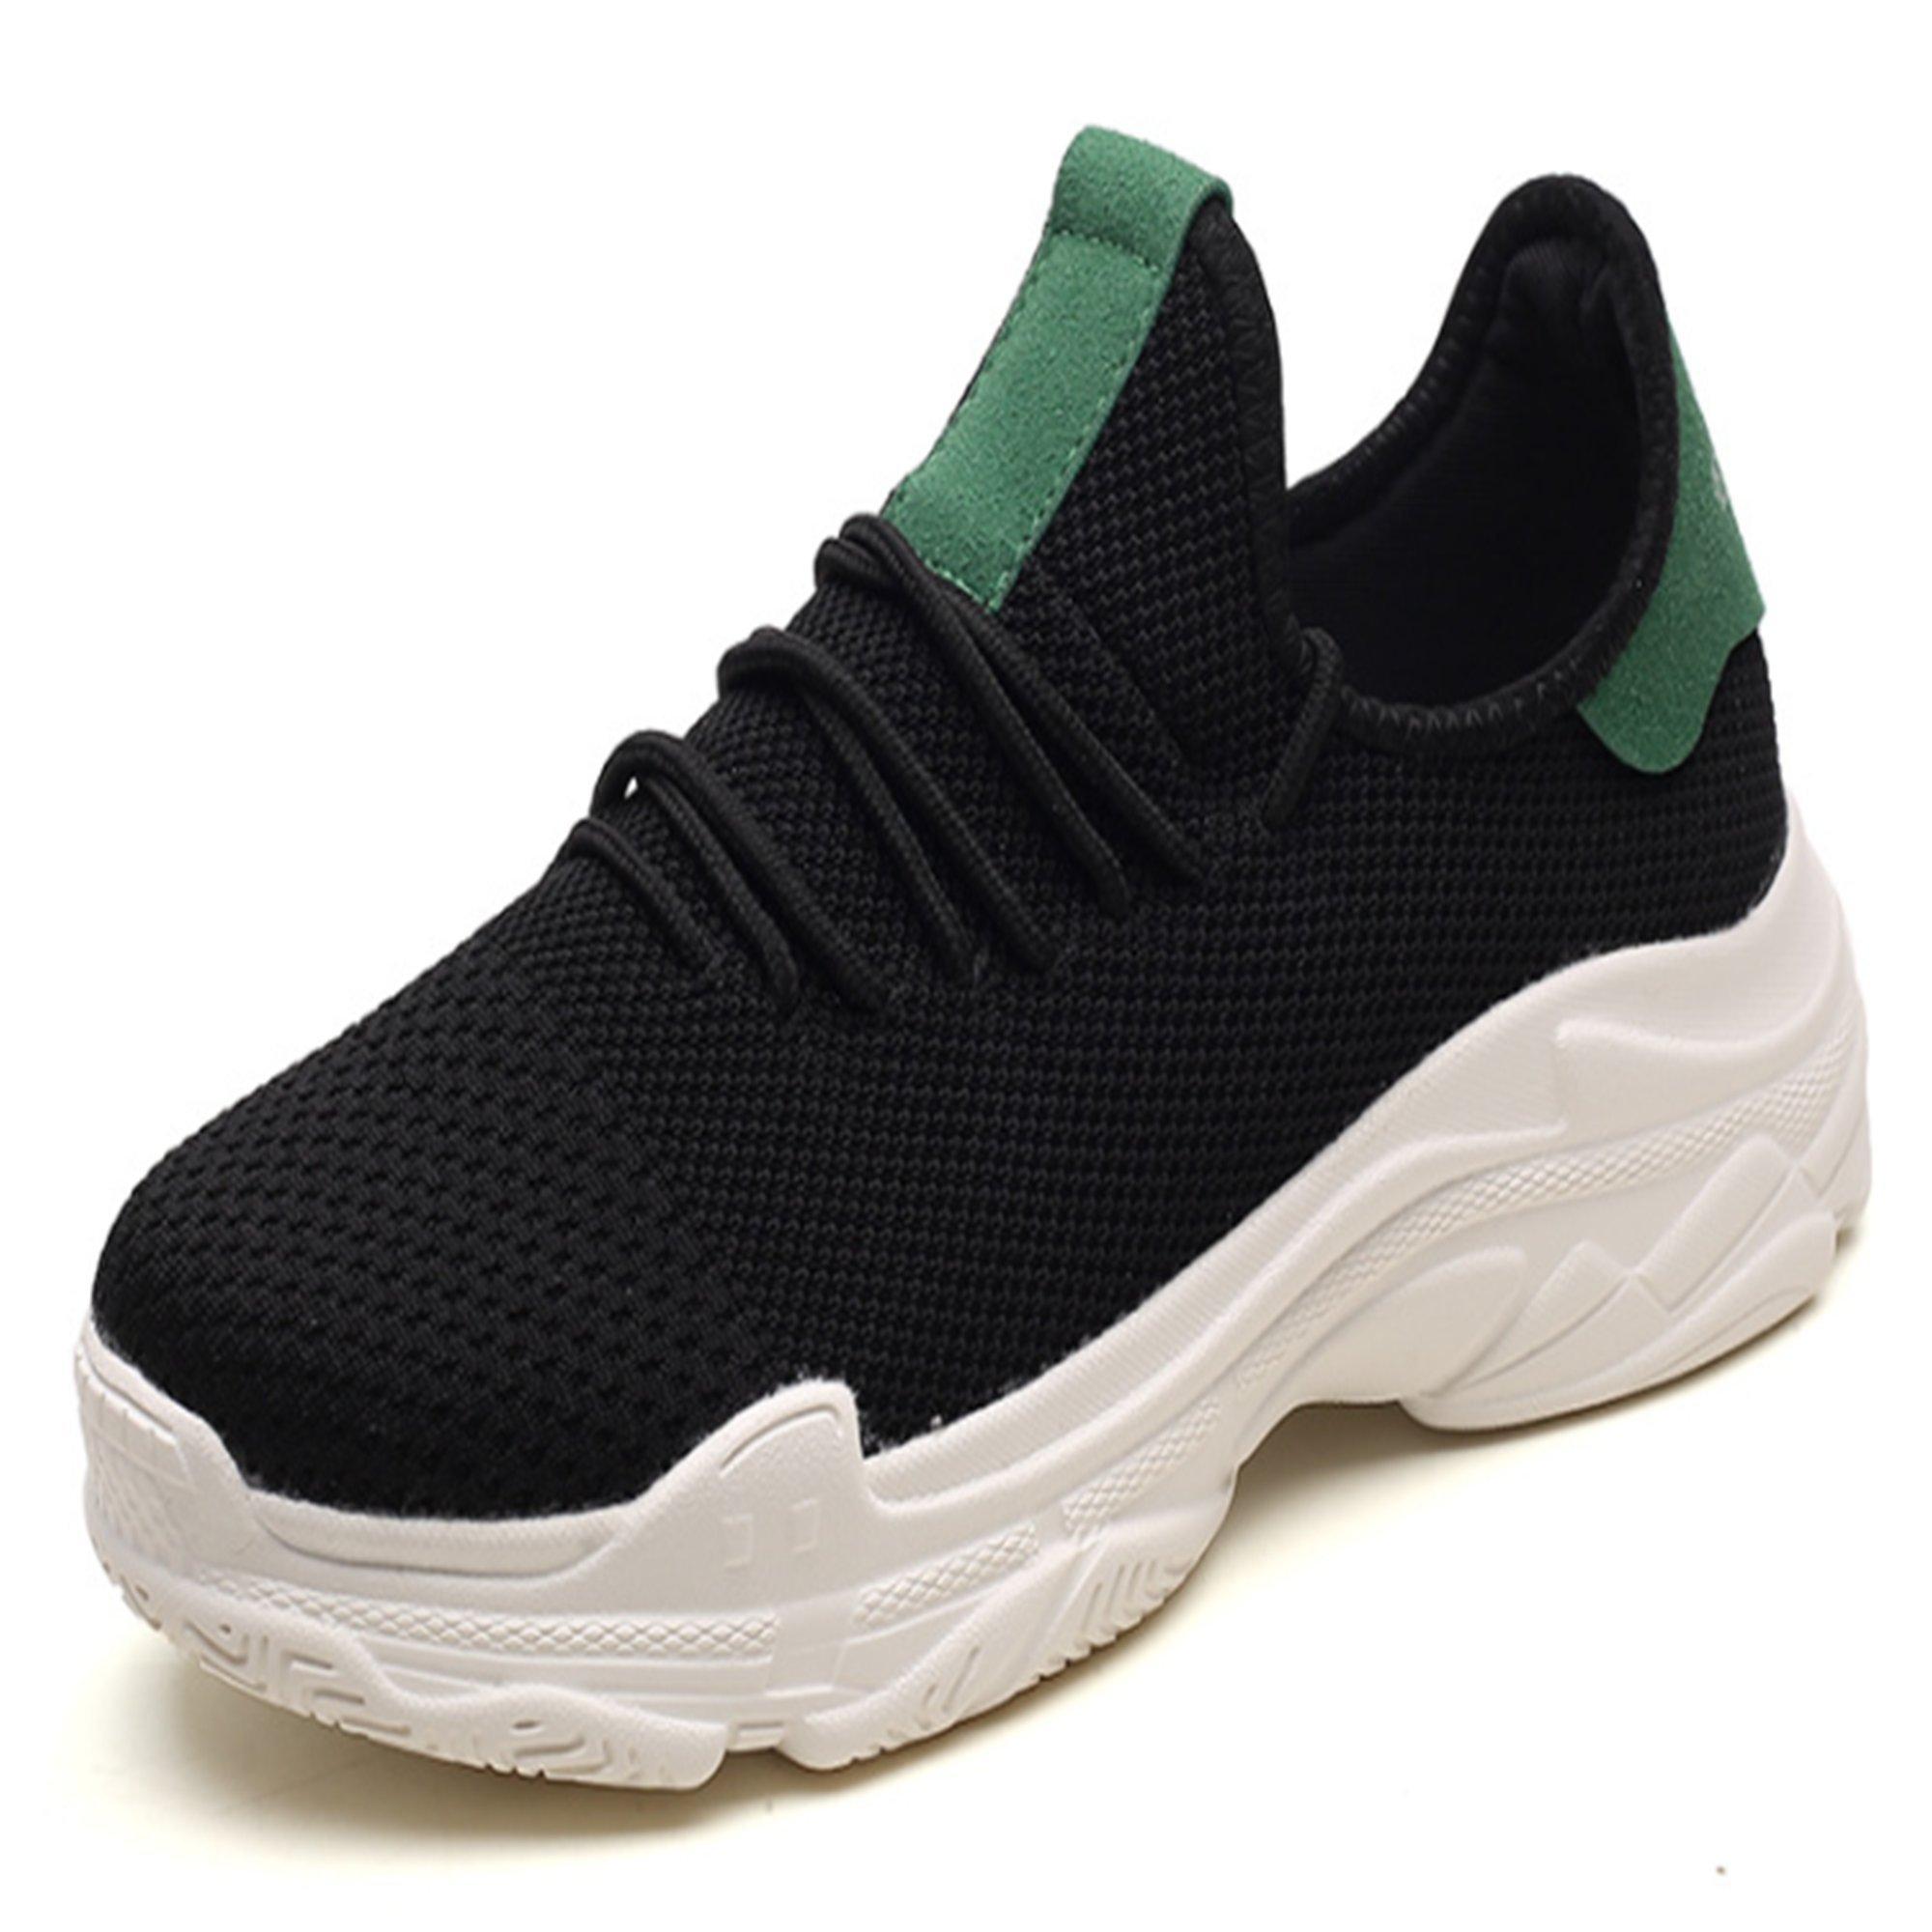 Yaheeda Running Shoes Men - Lightweight Air Mesh Casual Sports Sneakers Net Shoes